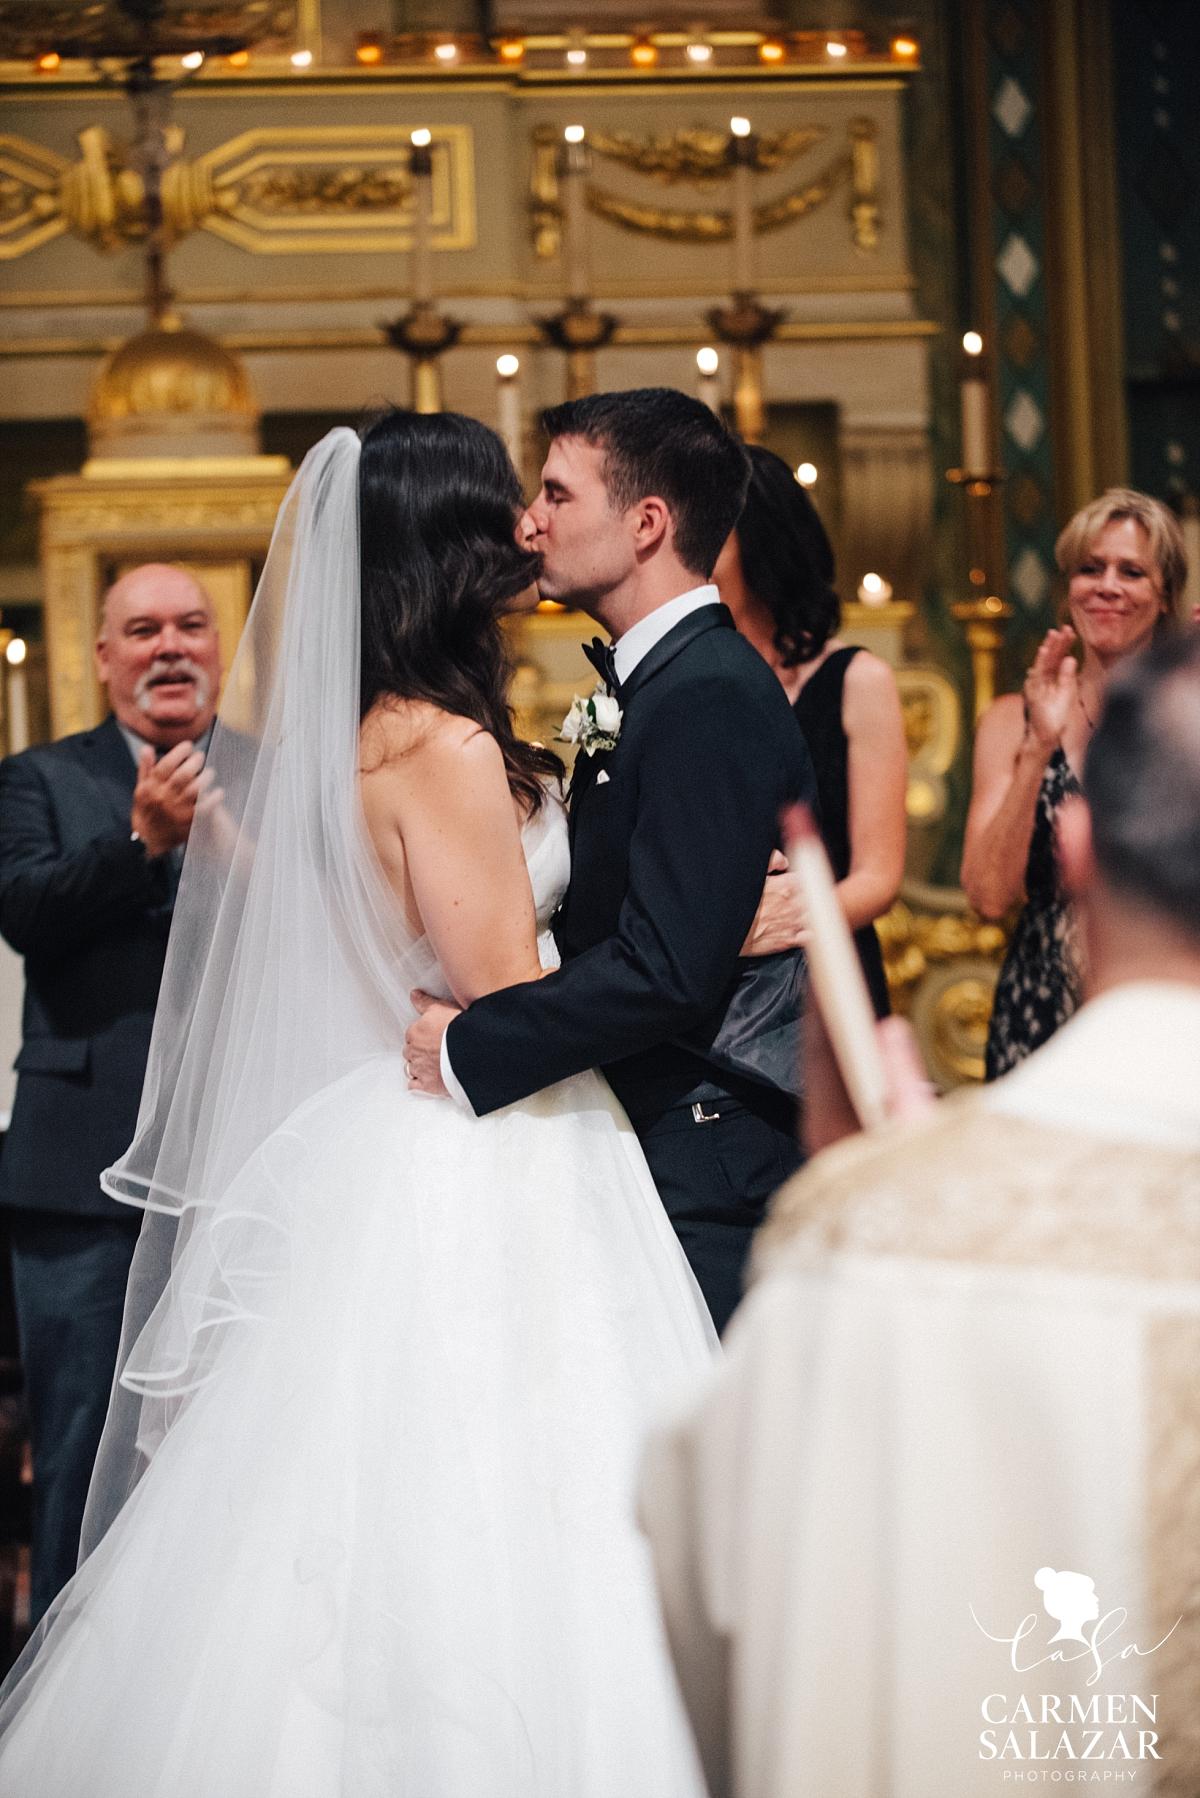 First kiss at Santa Clara Mission wedding - Carmen Salazar